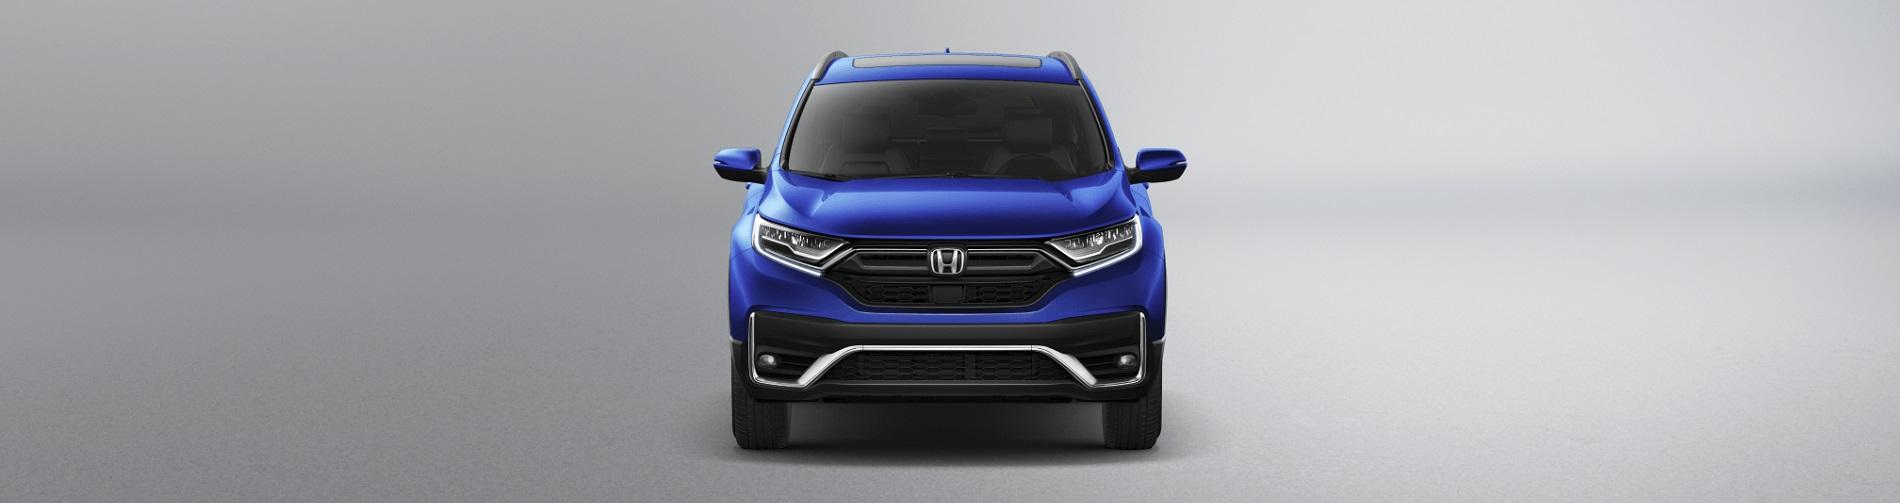 Honda CR-V Blue